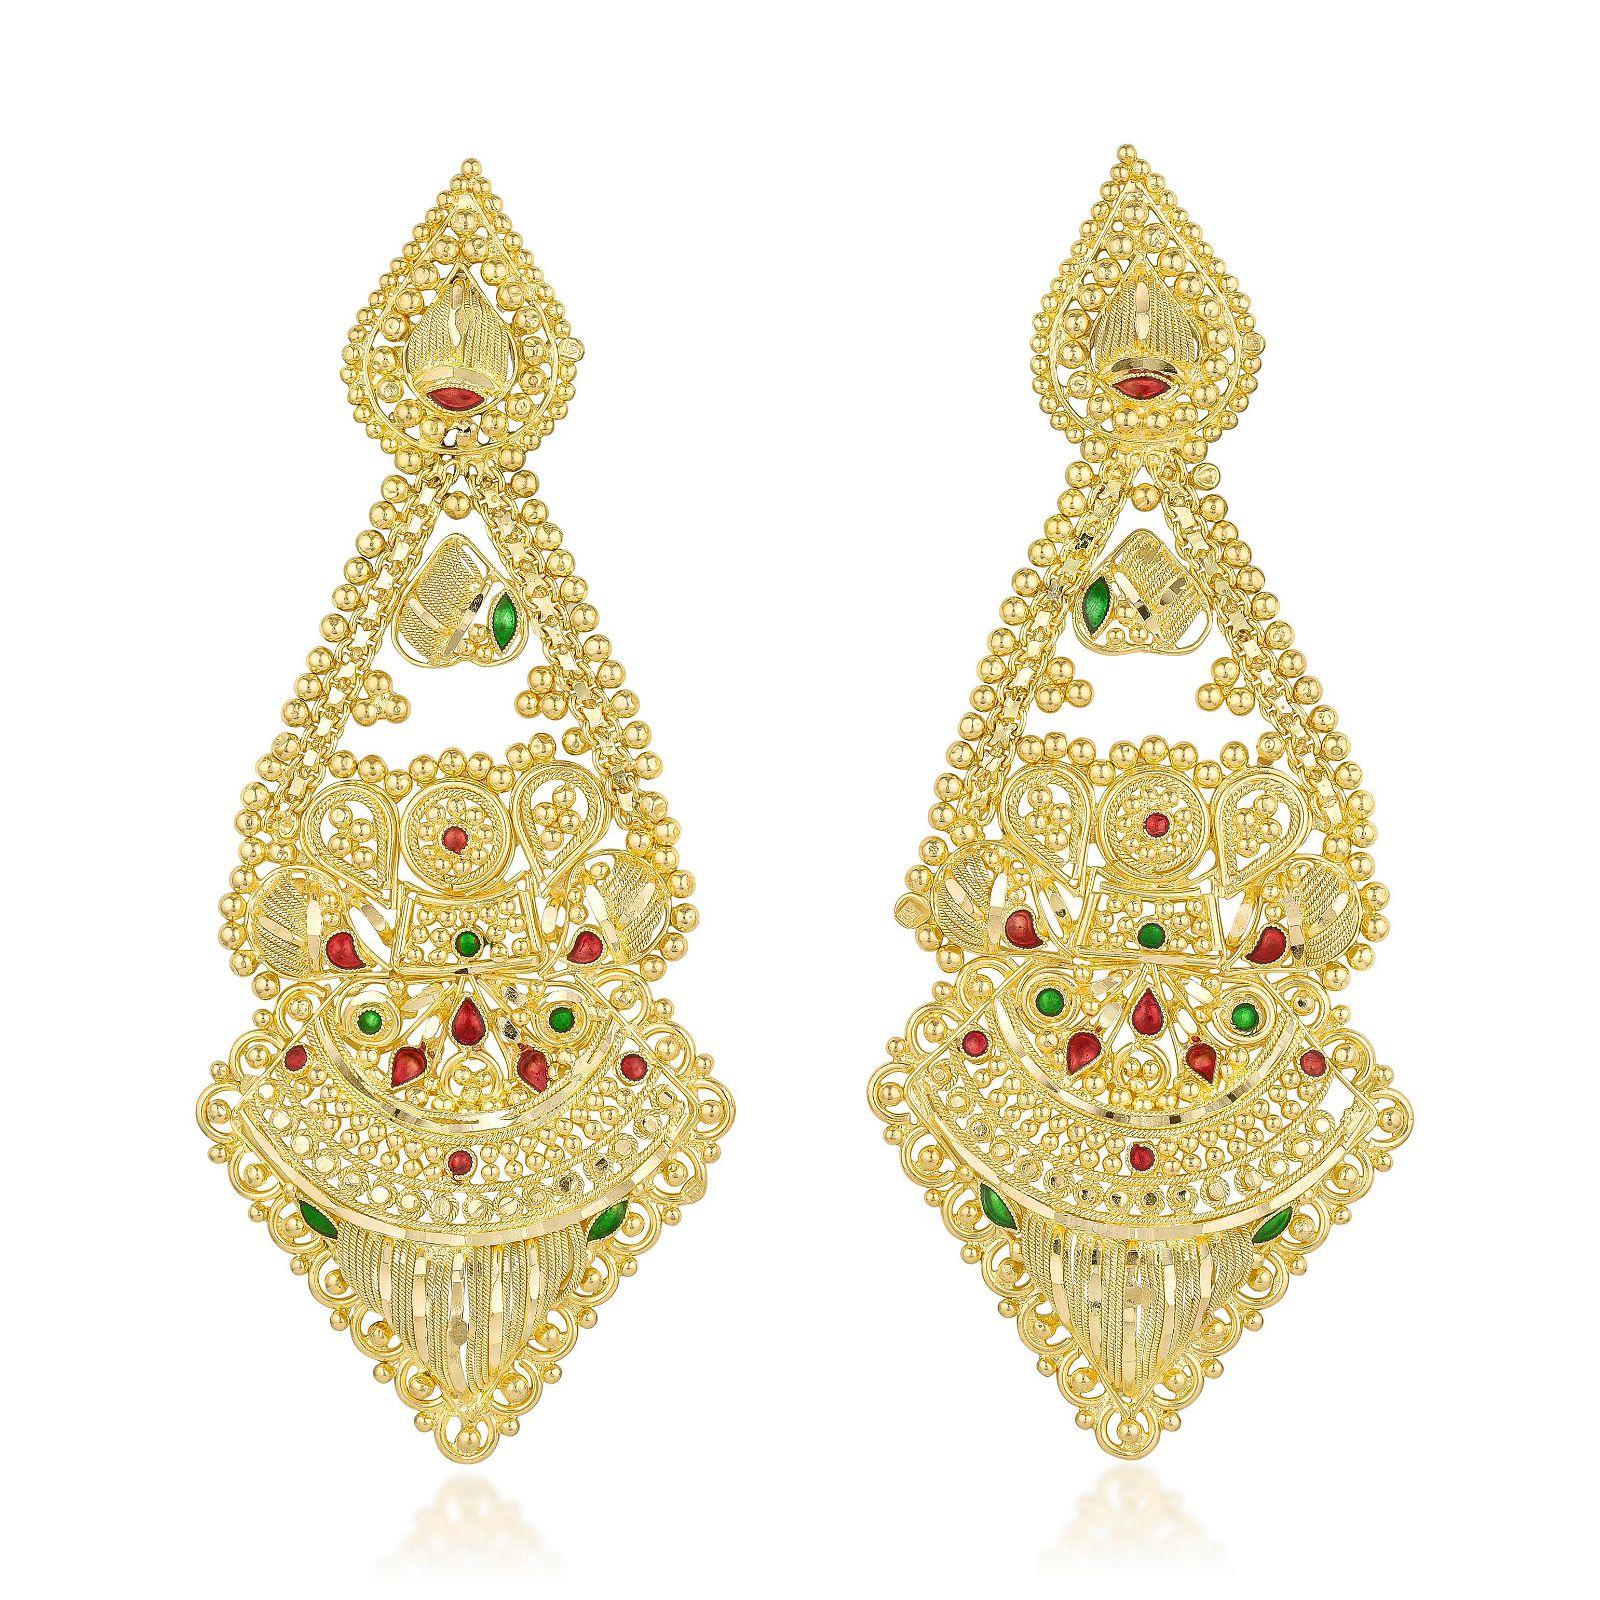 High Karat Gold Indian Dangle Earrings